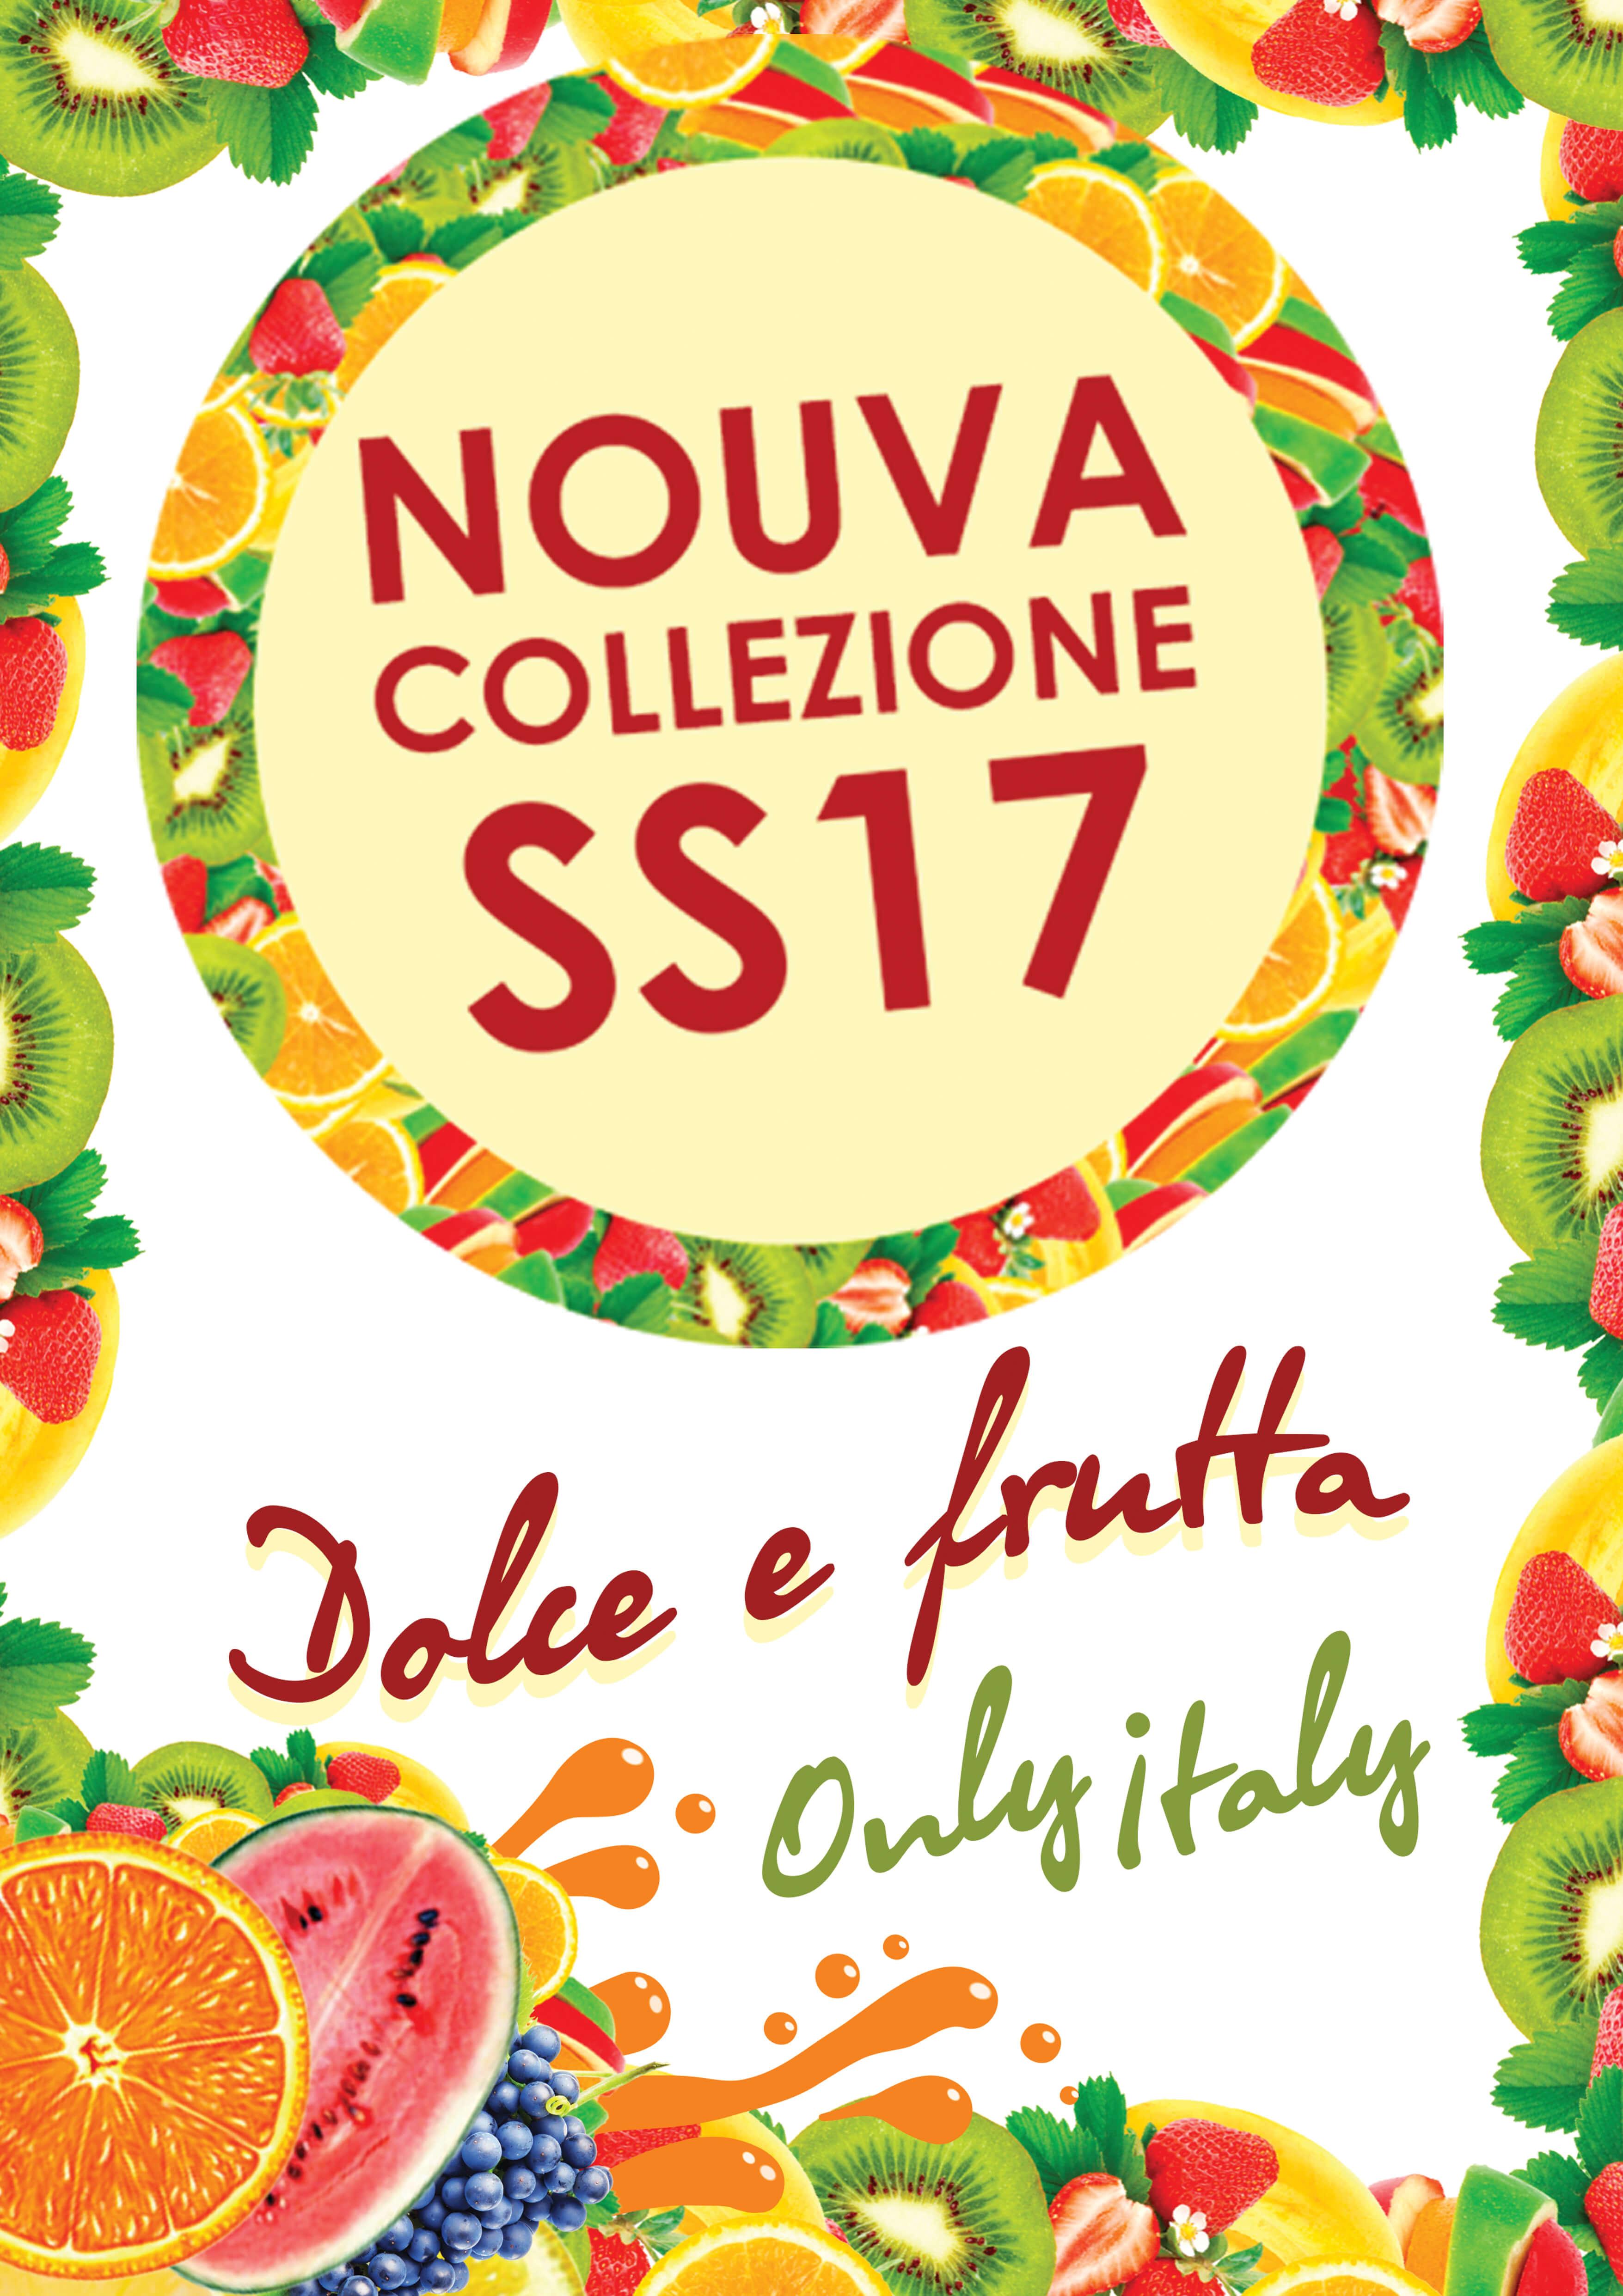 Нова колекція Only Italy весна-літо 2017